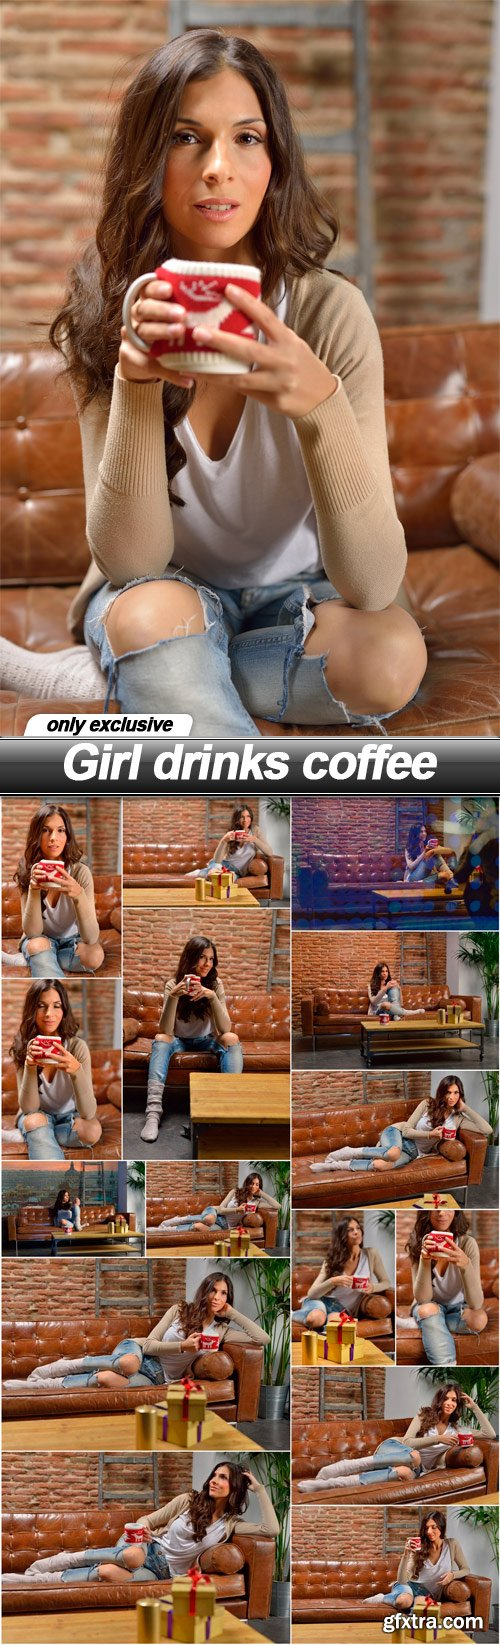 Girl drinks coffee - 15 UHQ JPEG